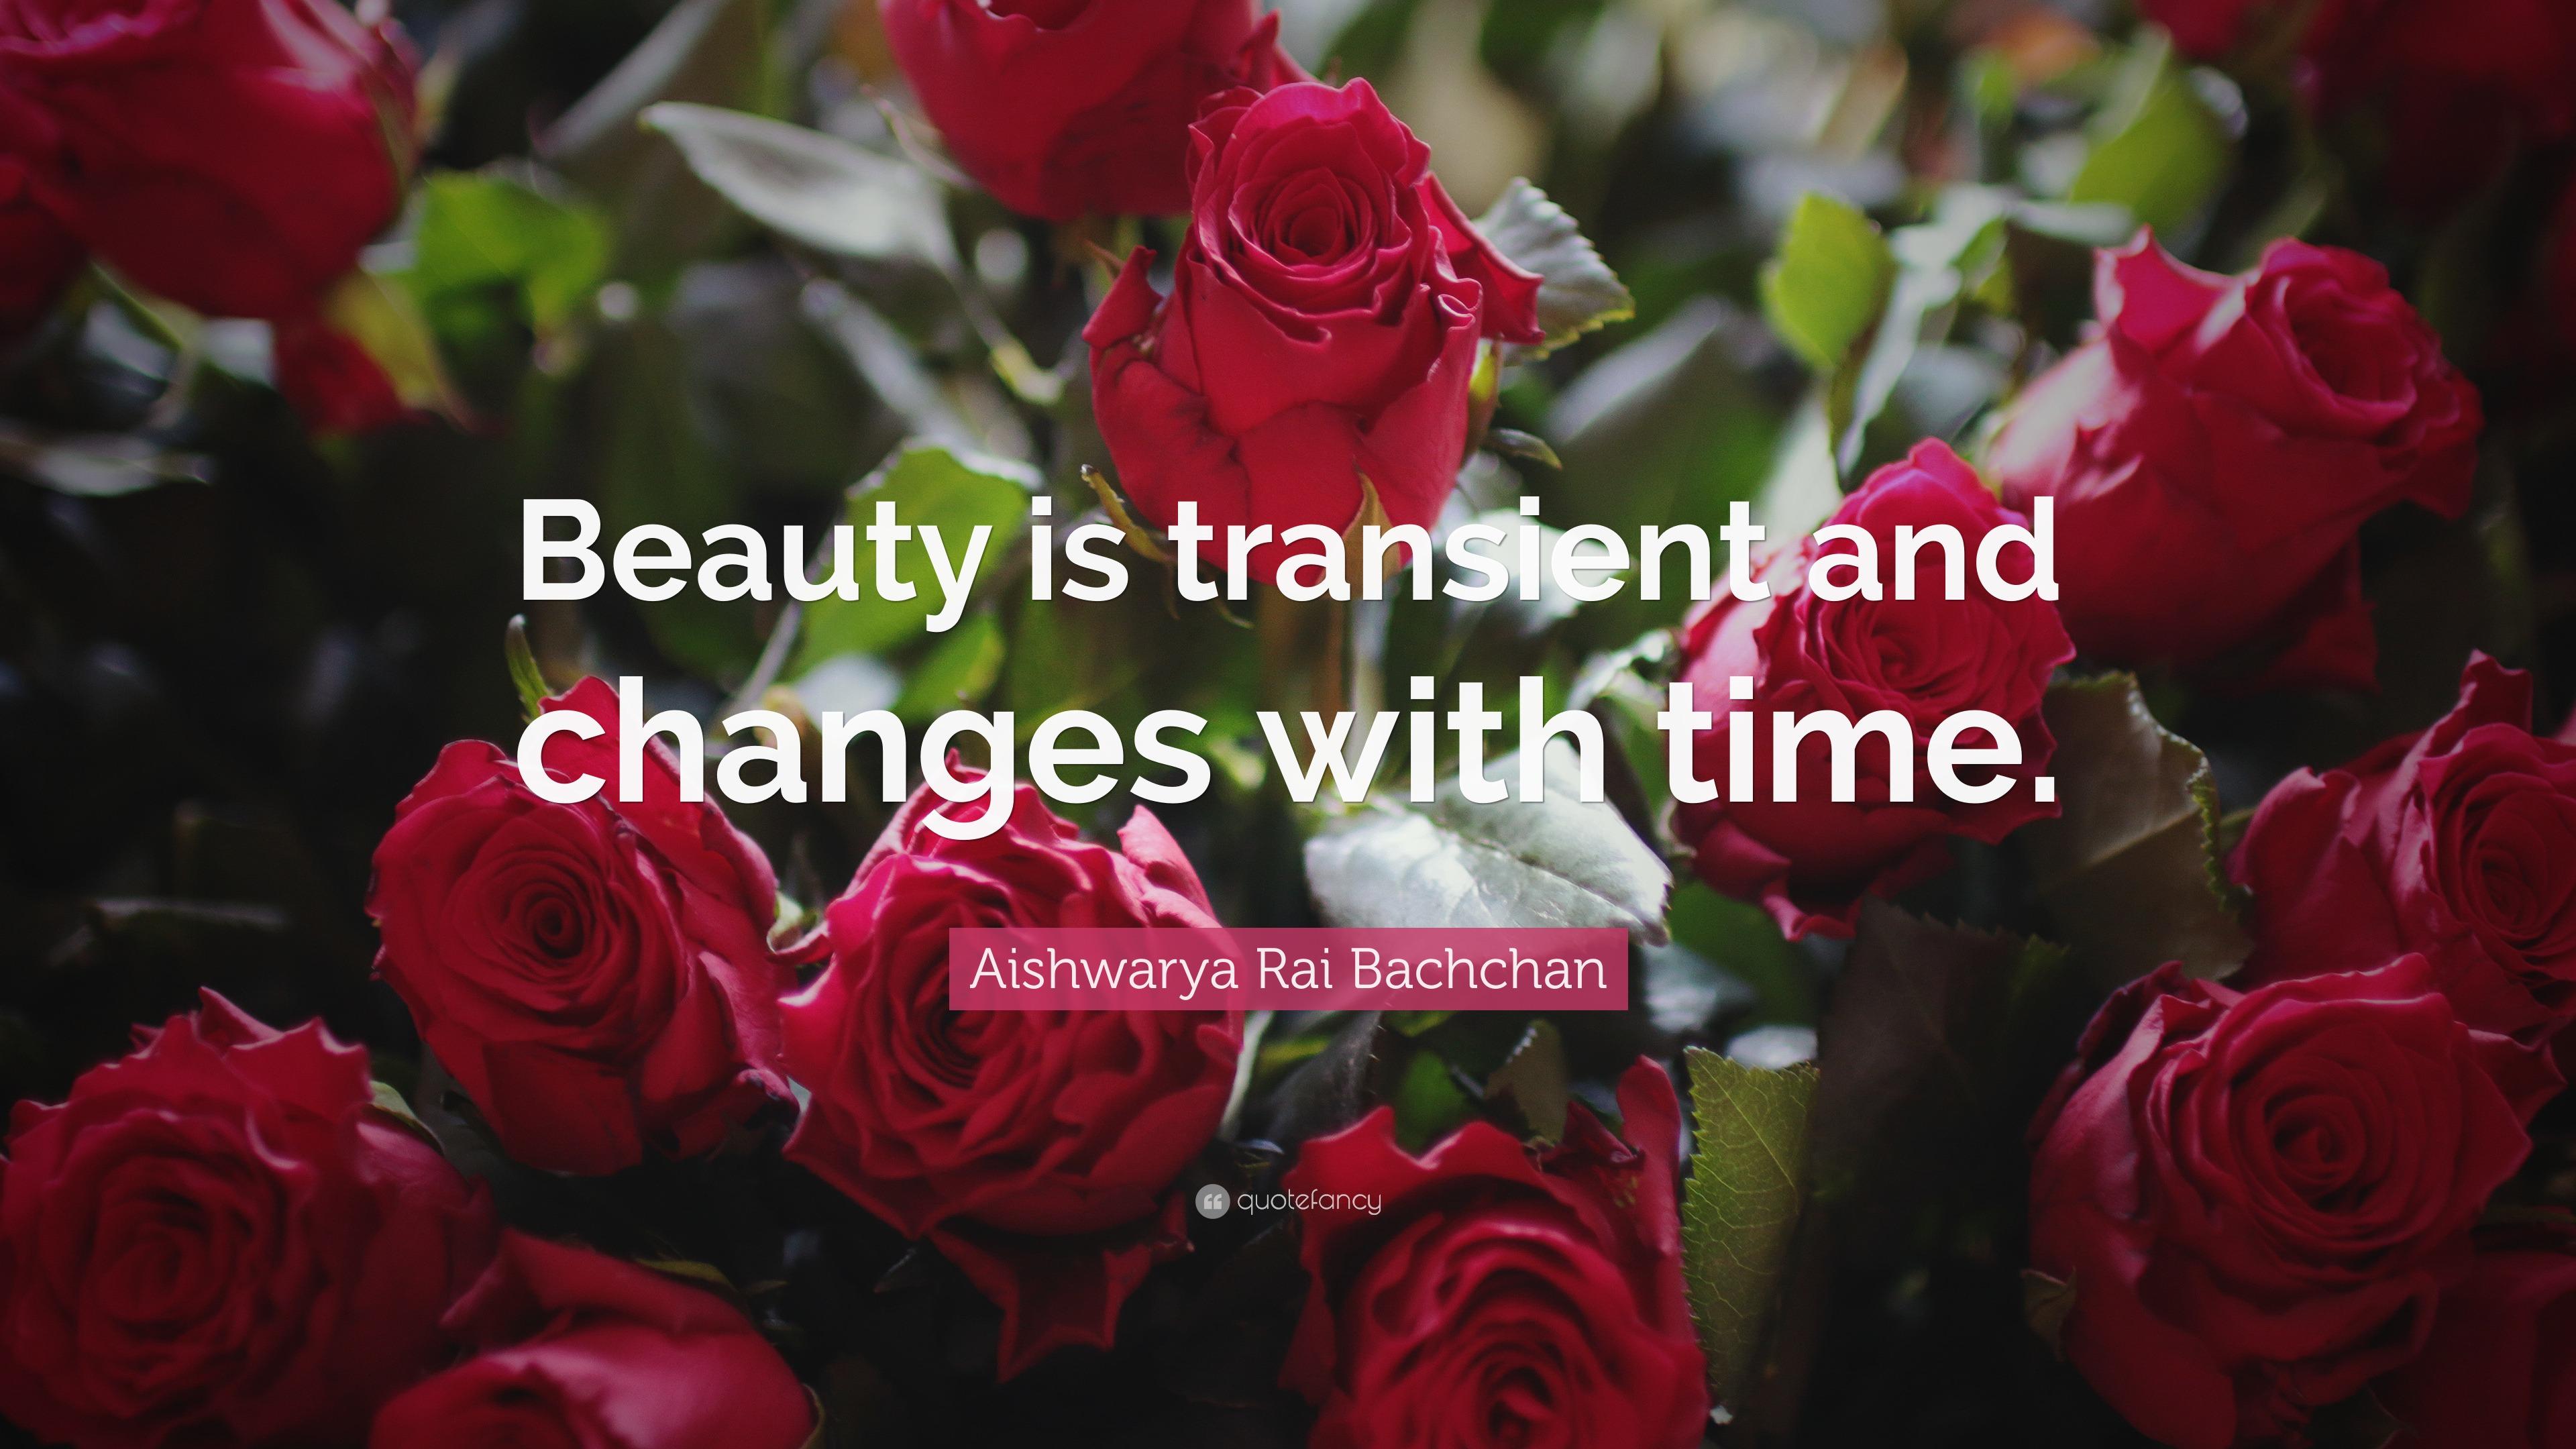 Aishwarya rai bachchan quote beauty is transient and changes with aishwarya rai bachchan quote beauty is transient and changes with time izmirmasajfo